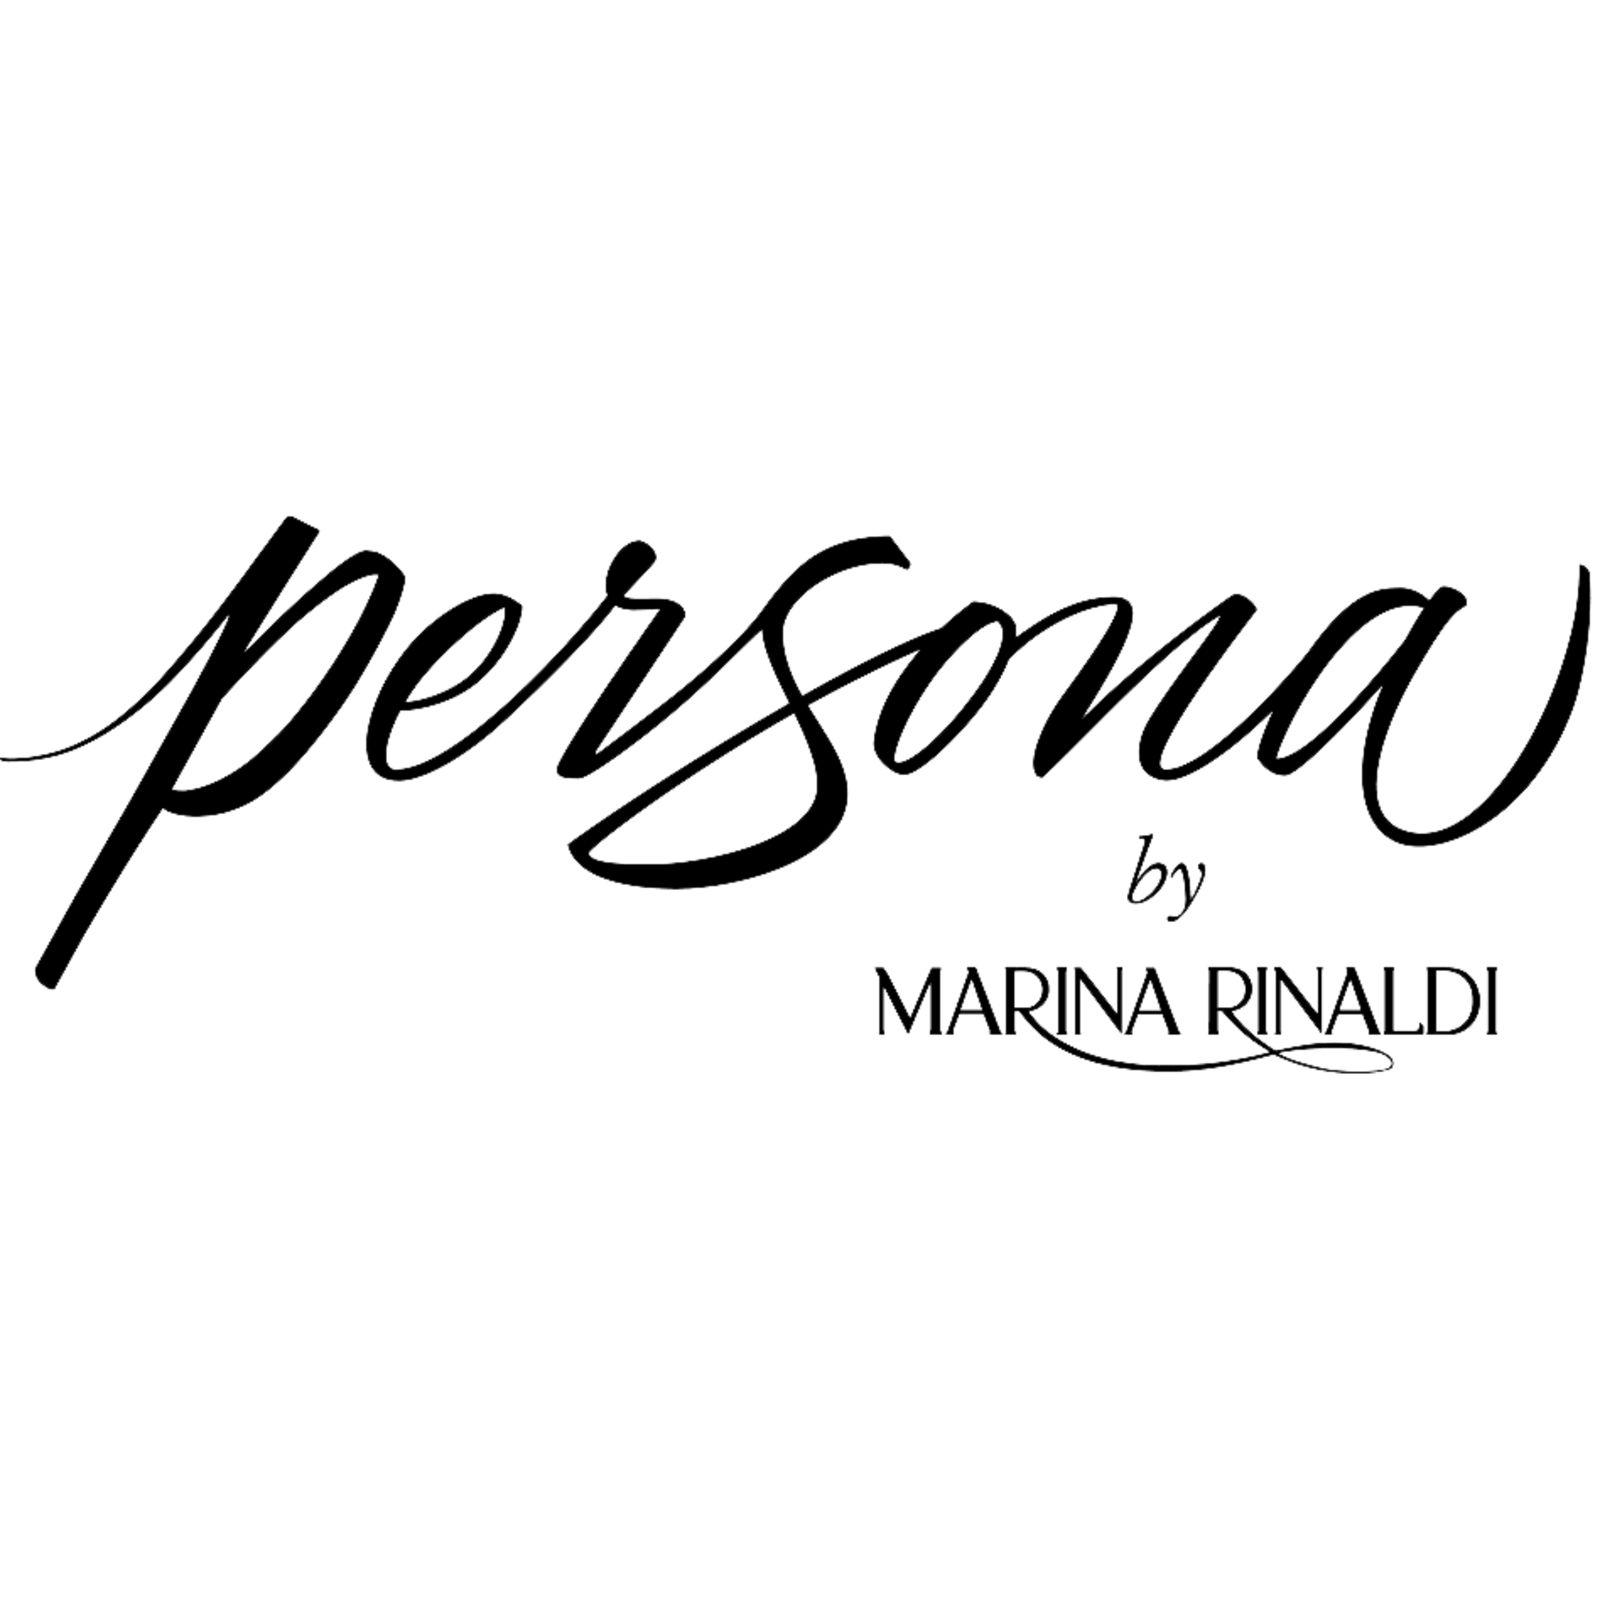 persona (Image 1)